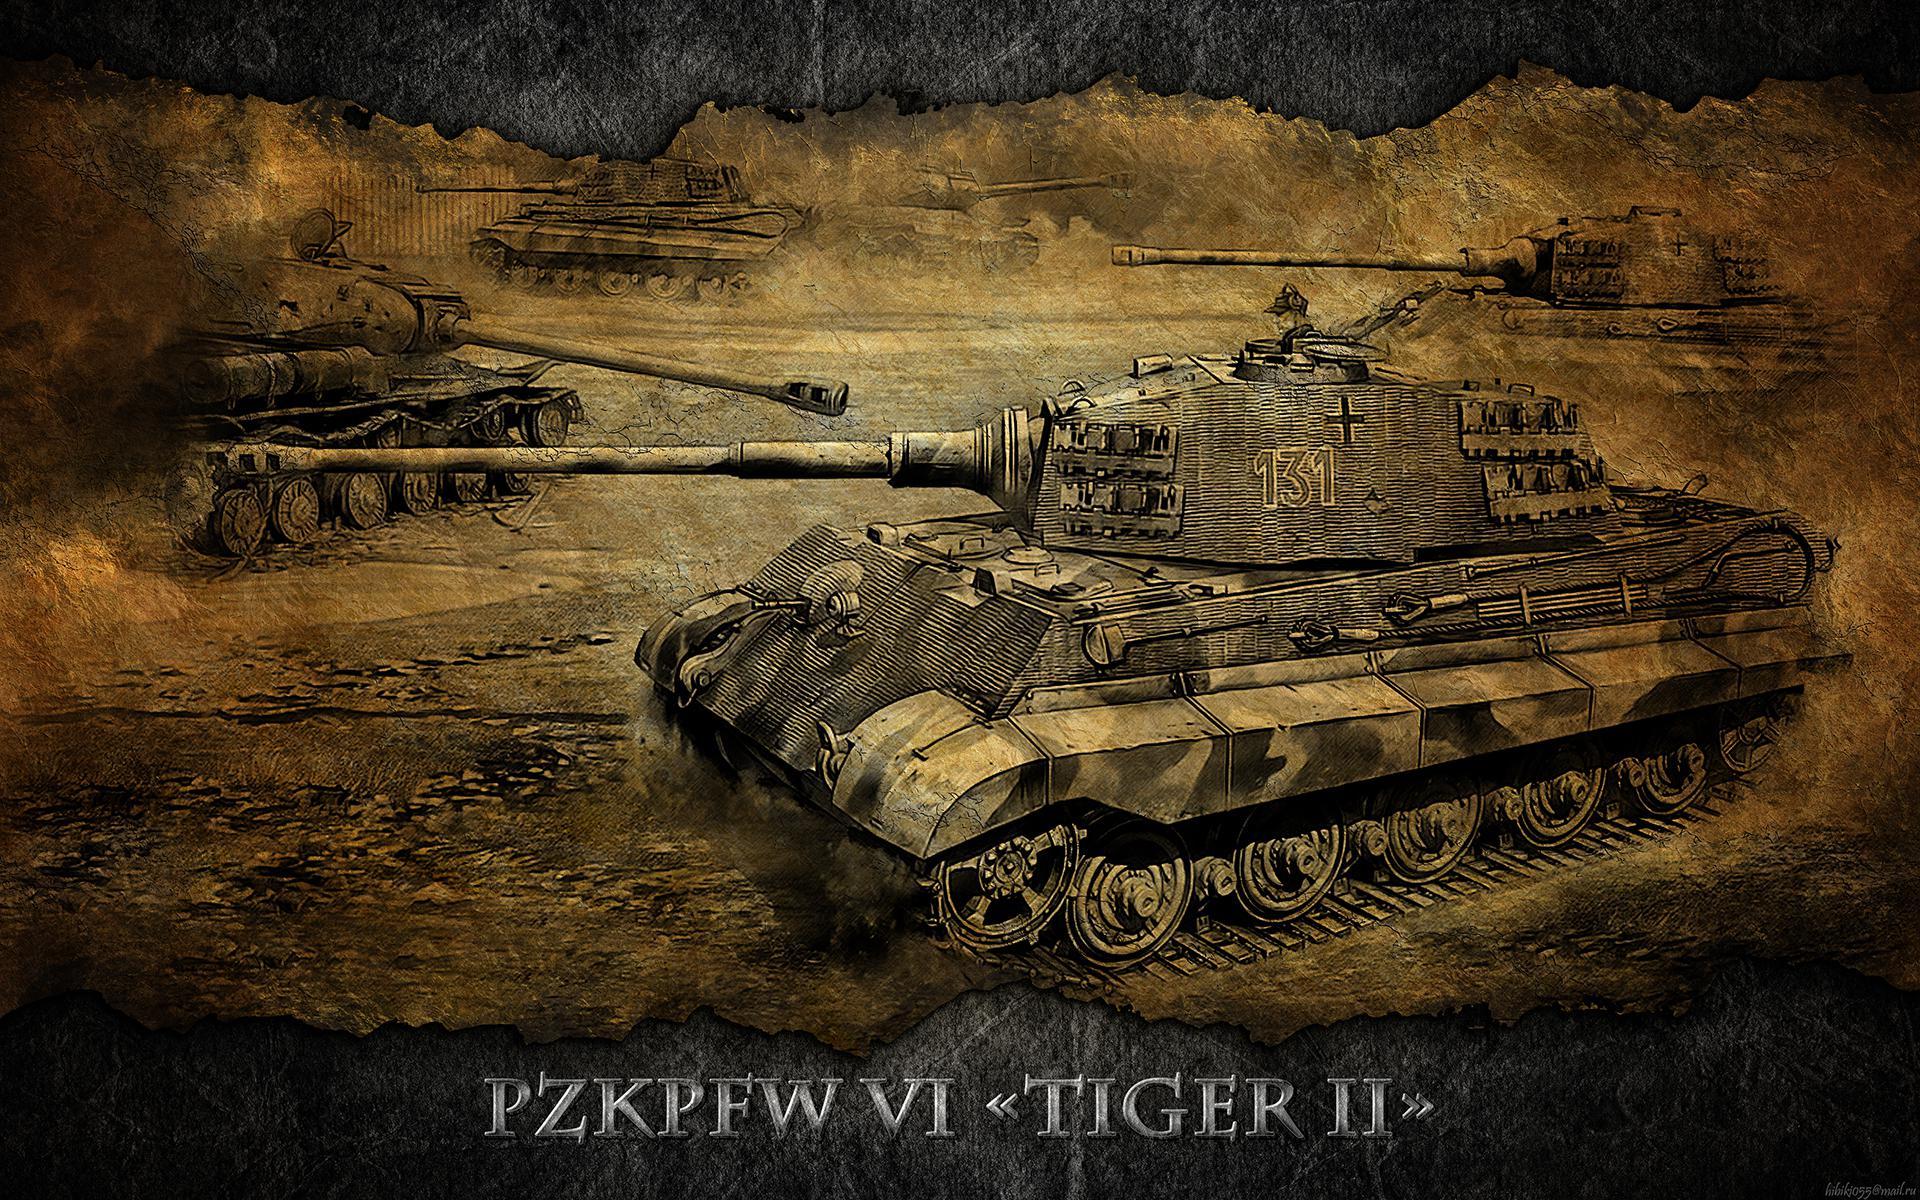 Girls Und Panzer Hd Wallpaper World Of Tanks Tanks Pzkpfw Vib Tiger Ii Games Wallpaper